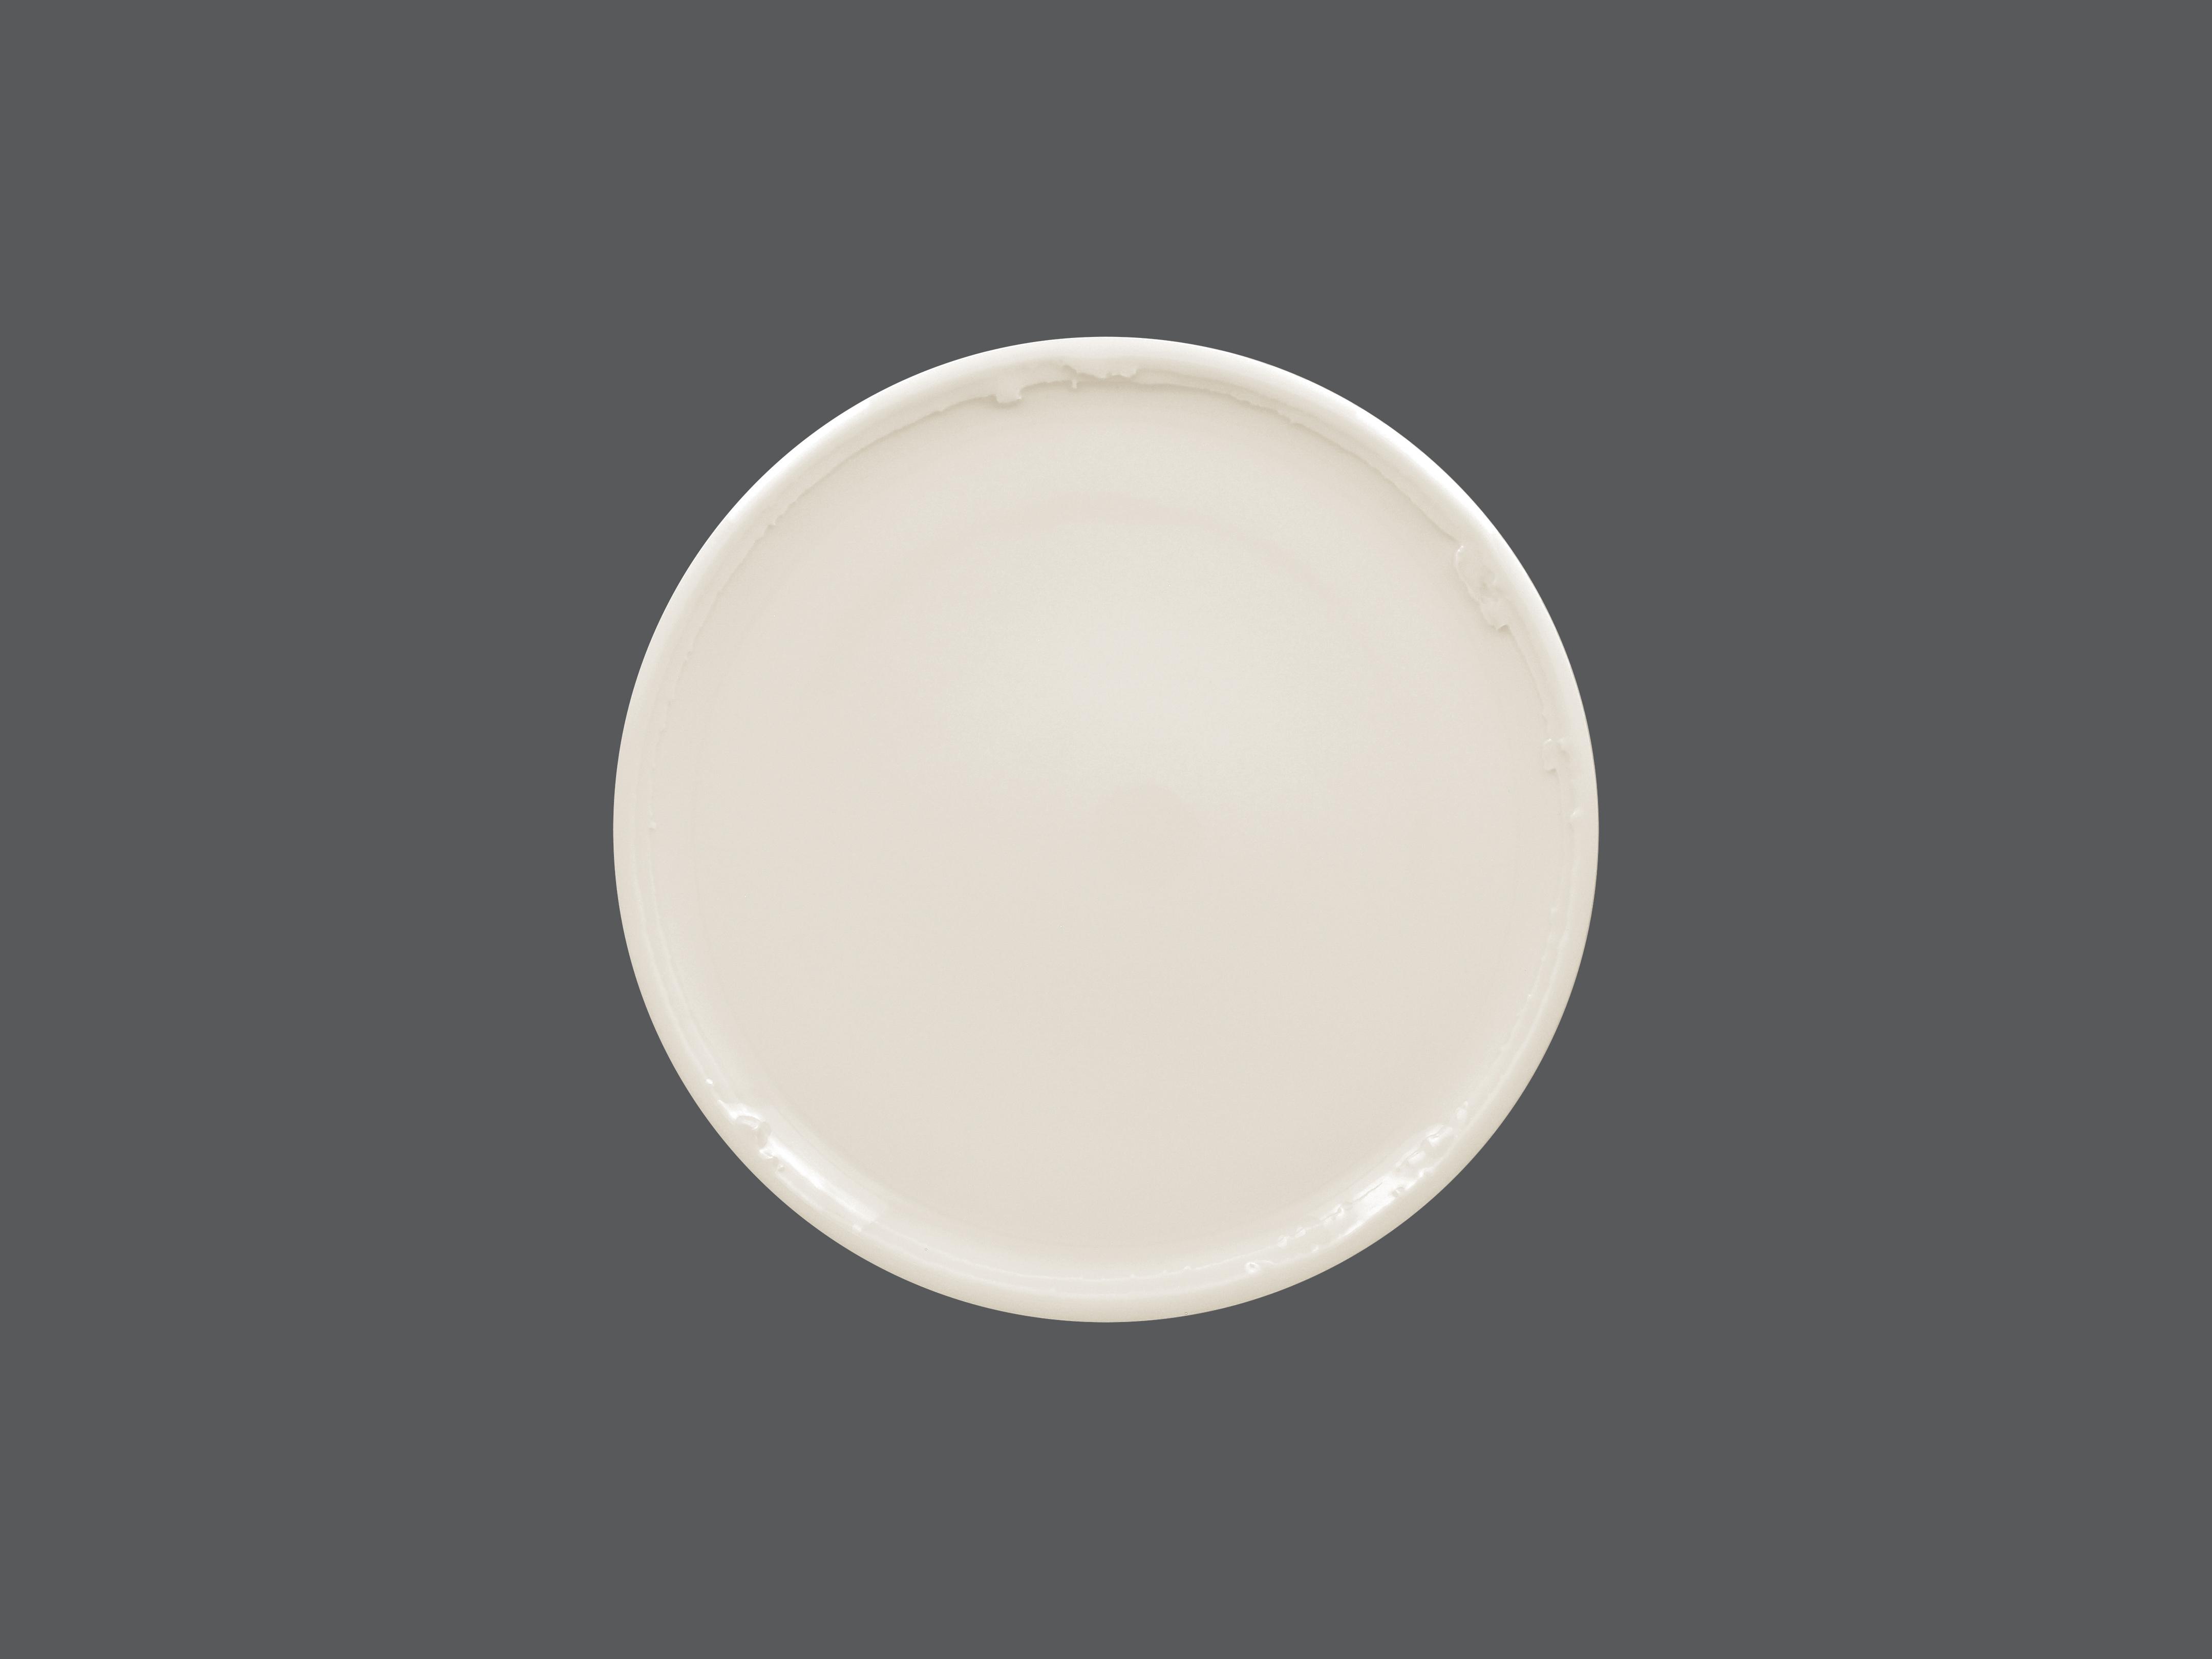 Sketches talíř mělký 24 cm - bílá